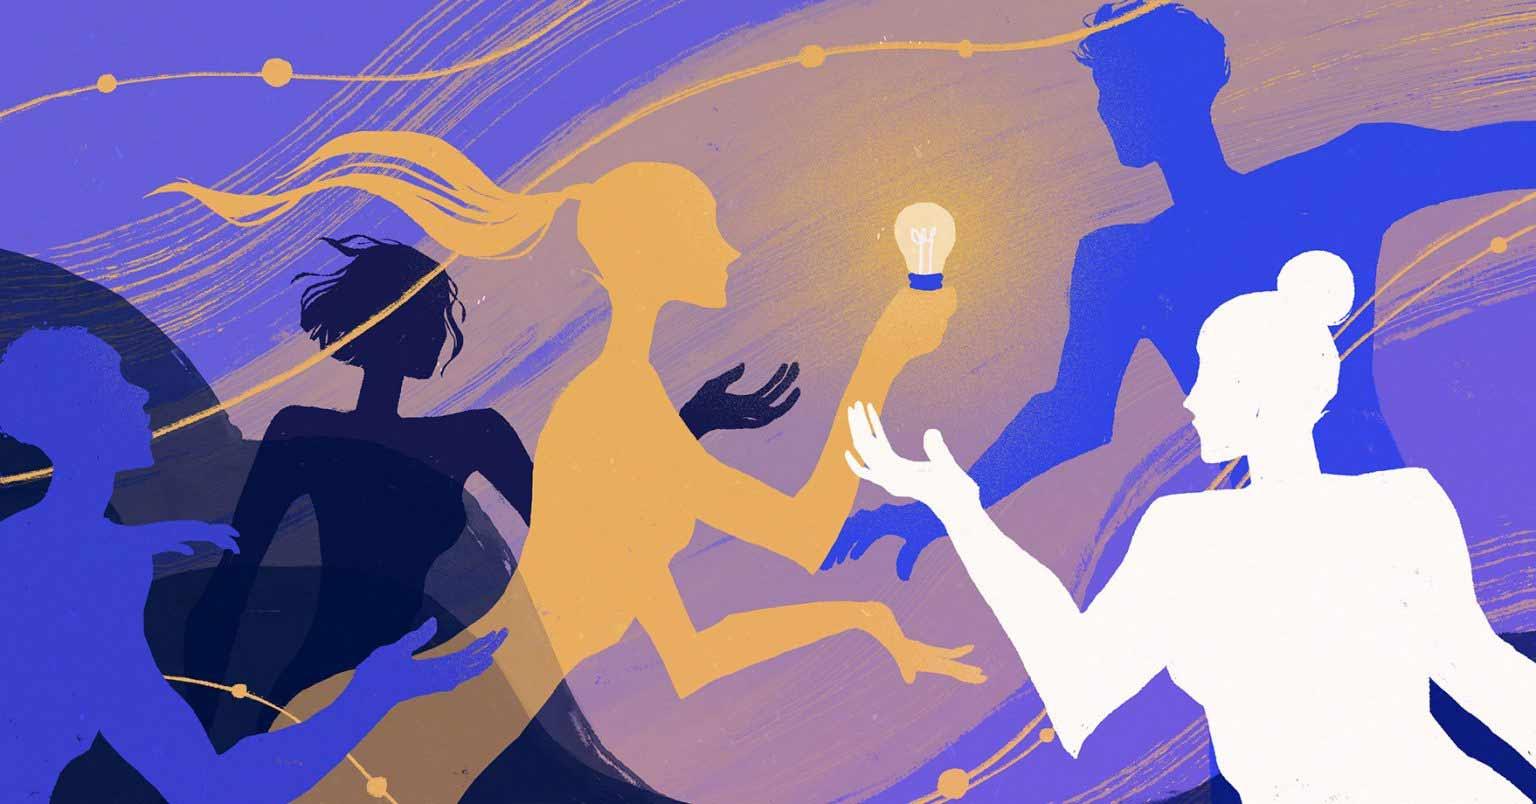 Illustrationen von Samantha Mash samantha-mash-illustrationen_08